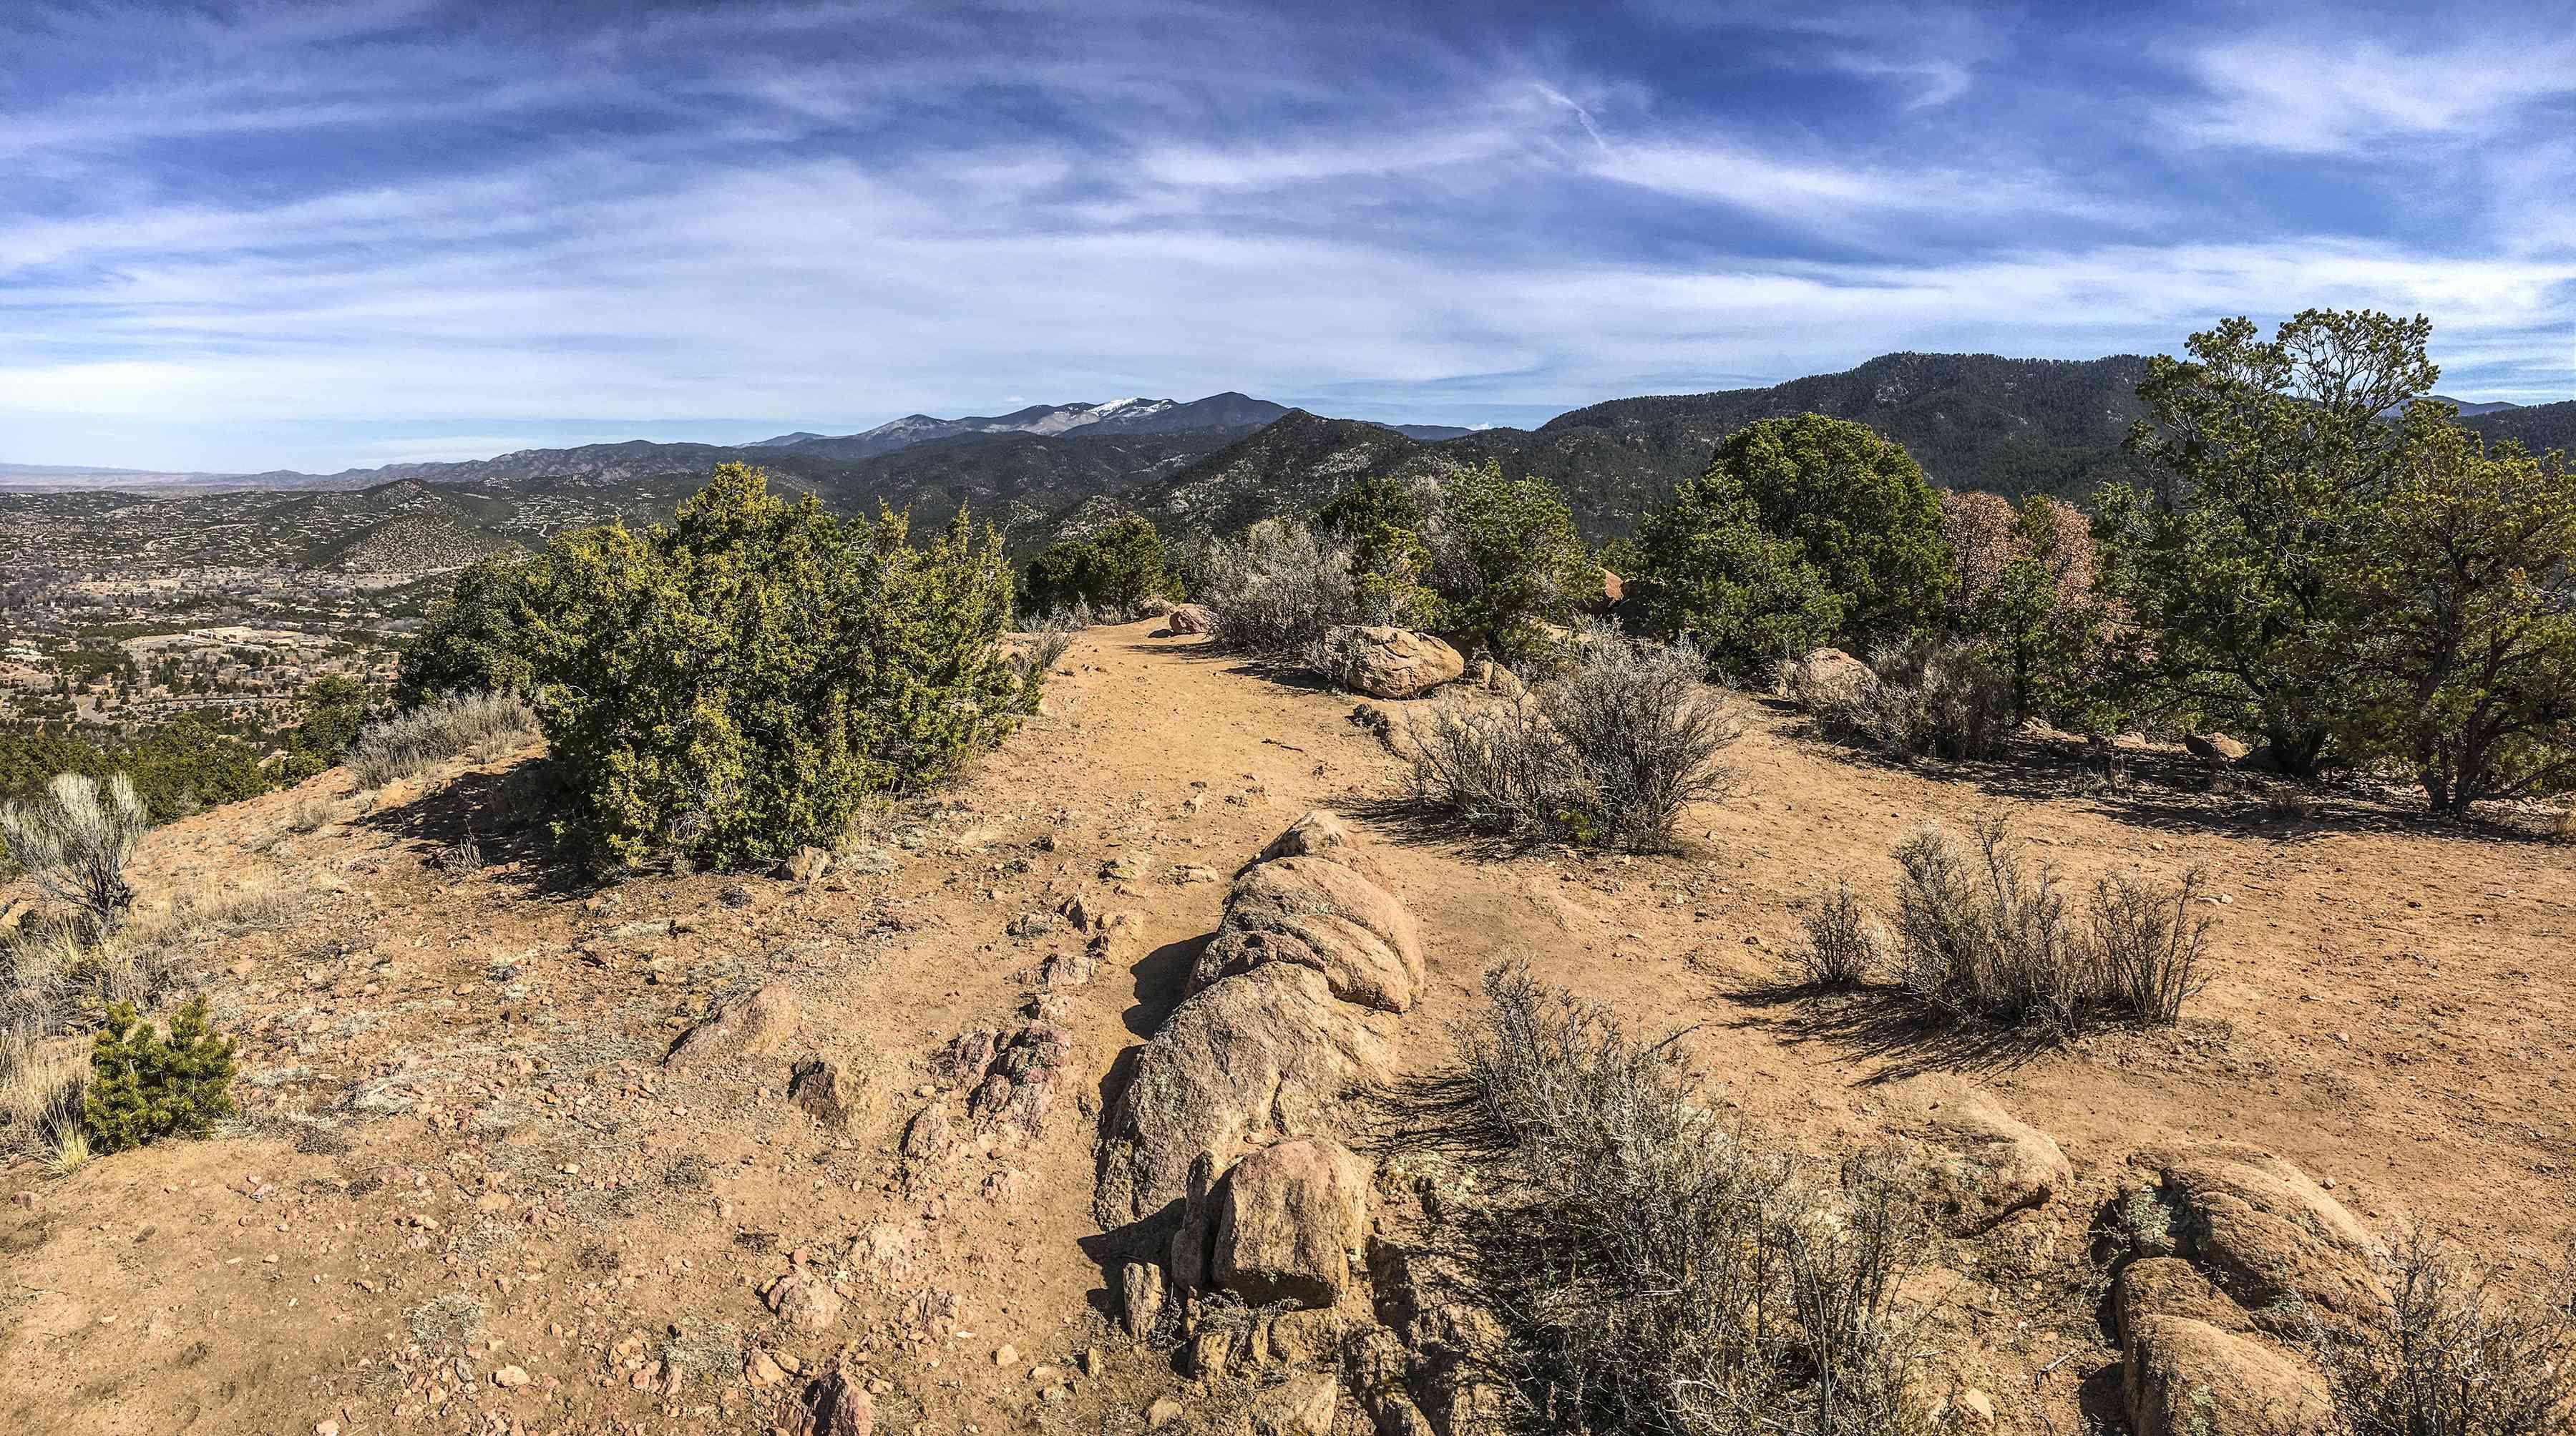 Above Santa Fe